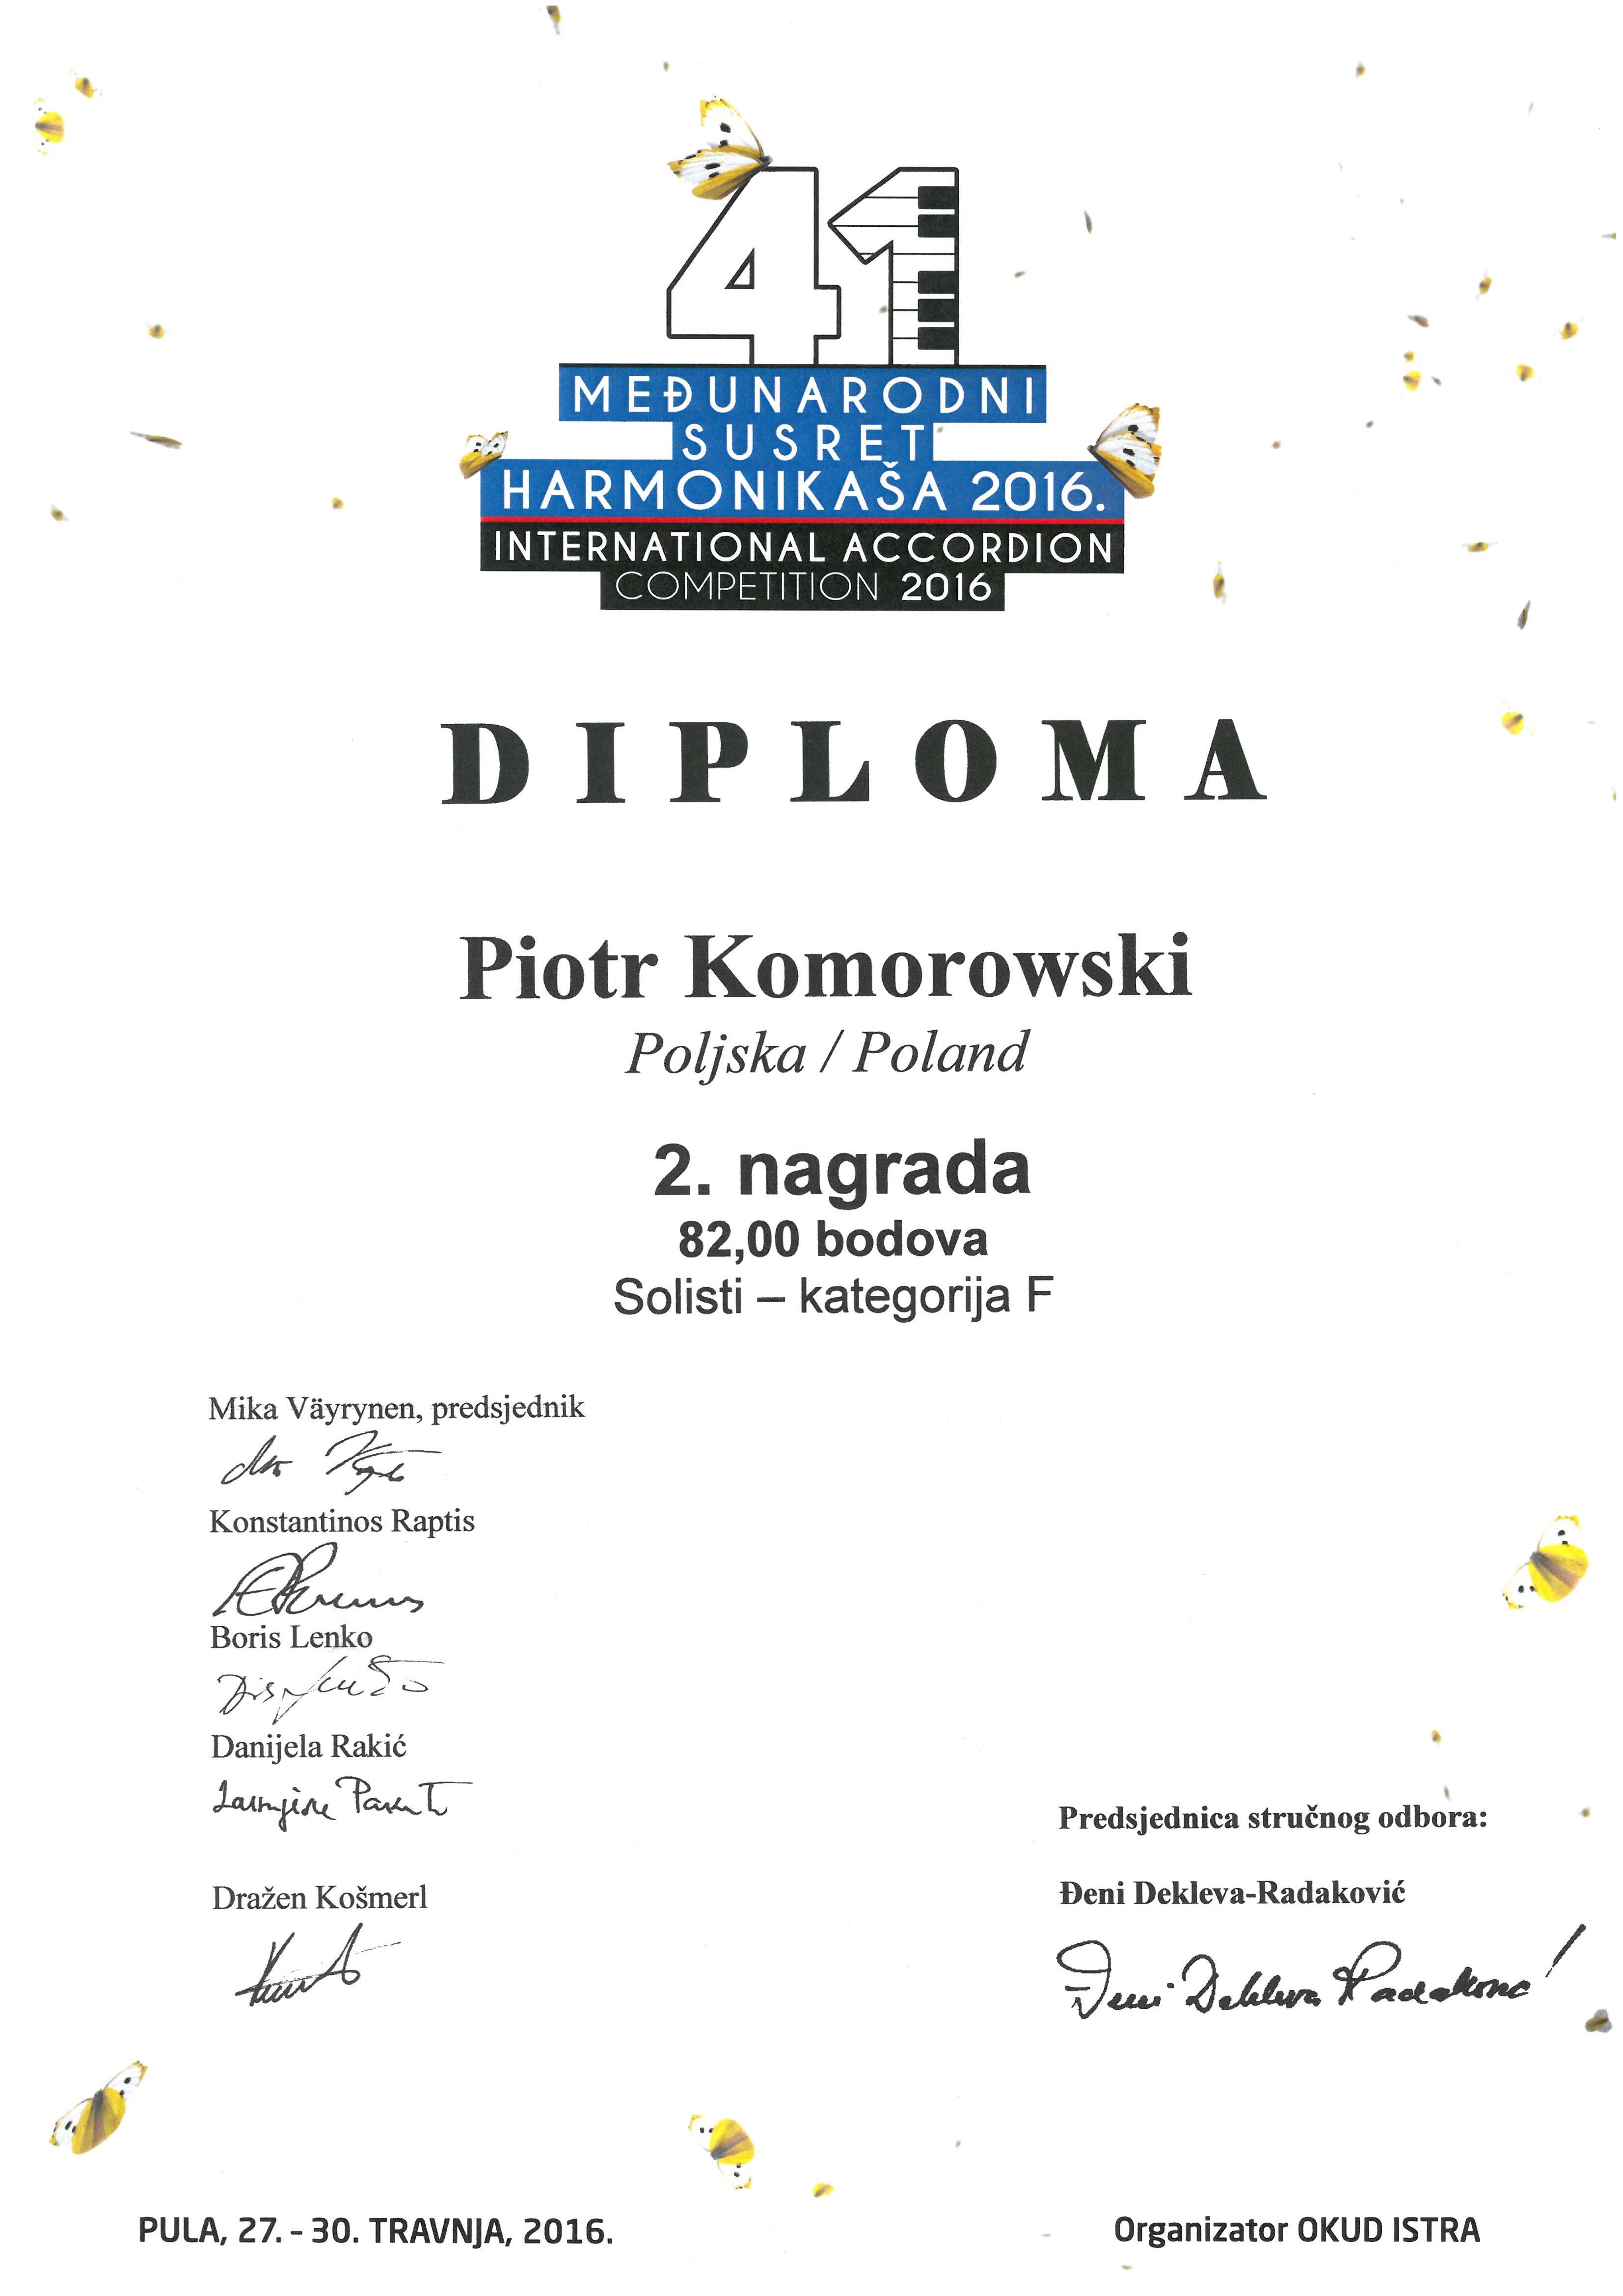 Piotr Komorowski_Pula_2016